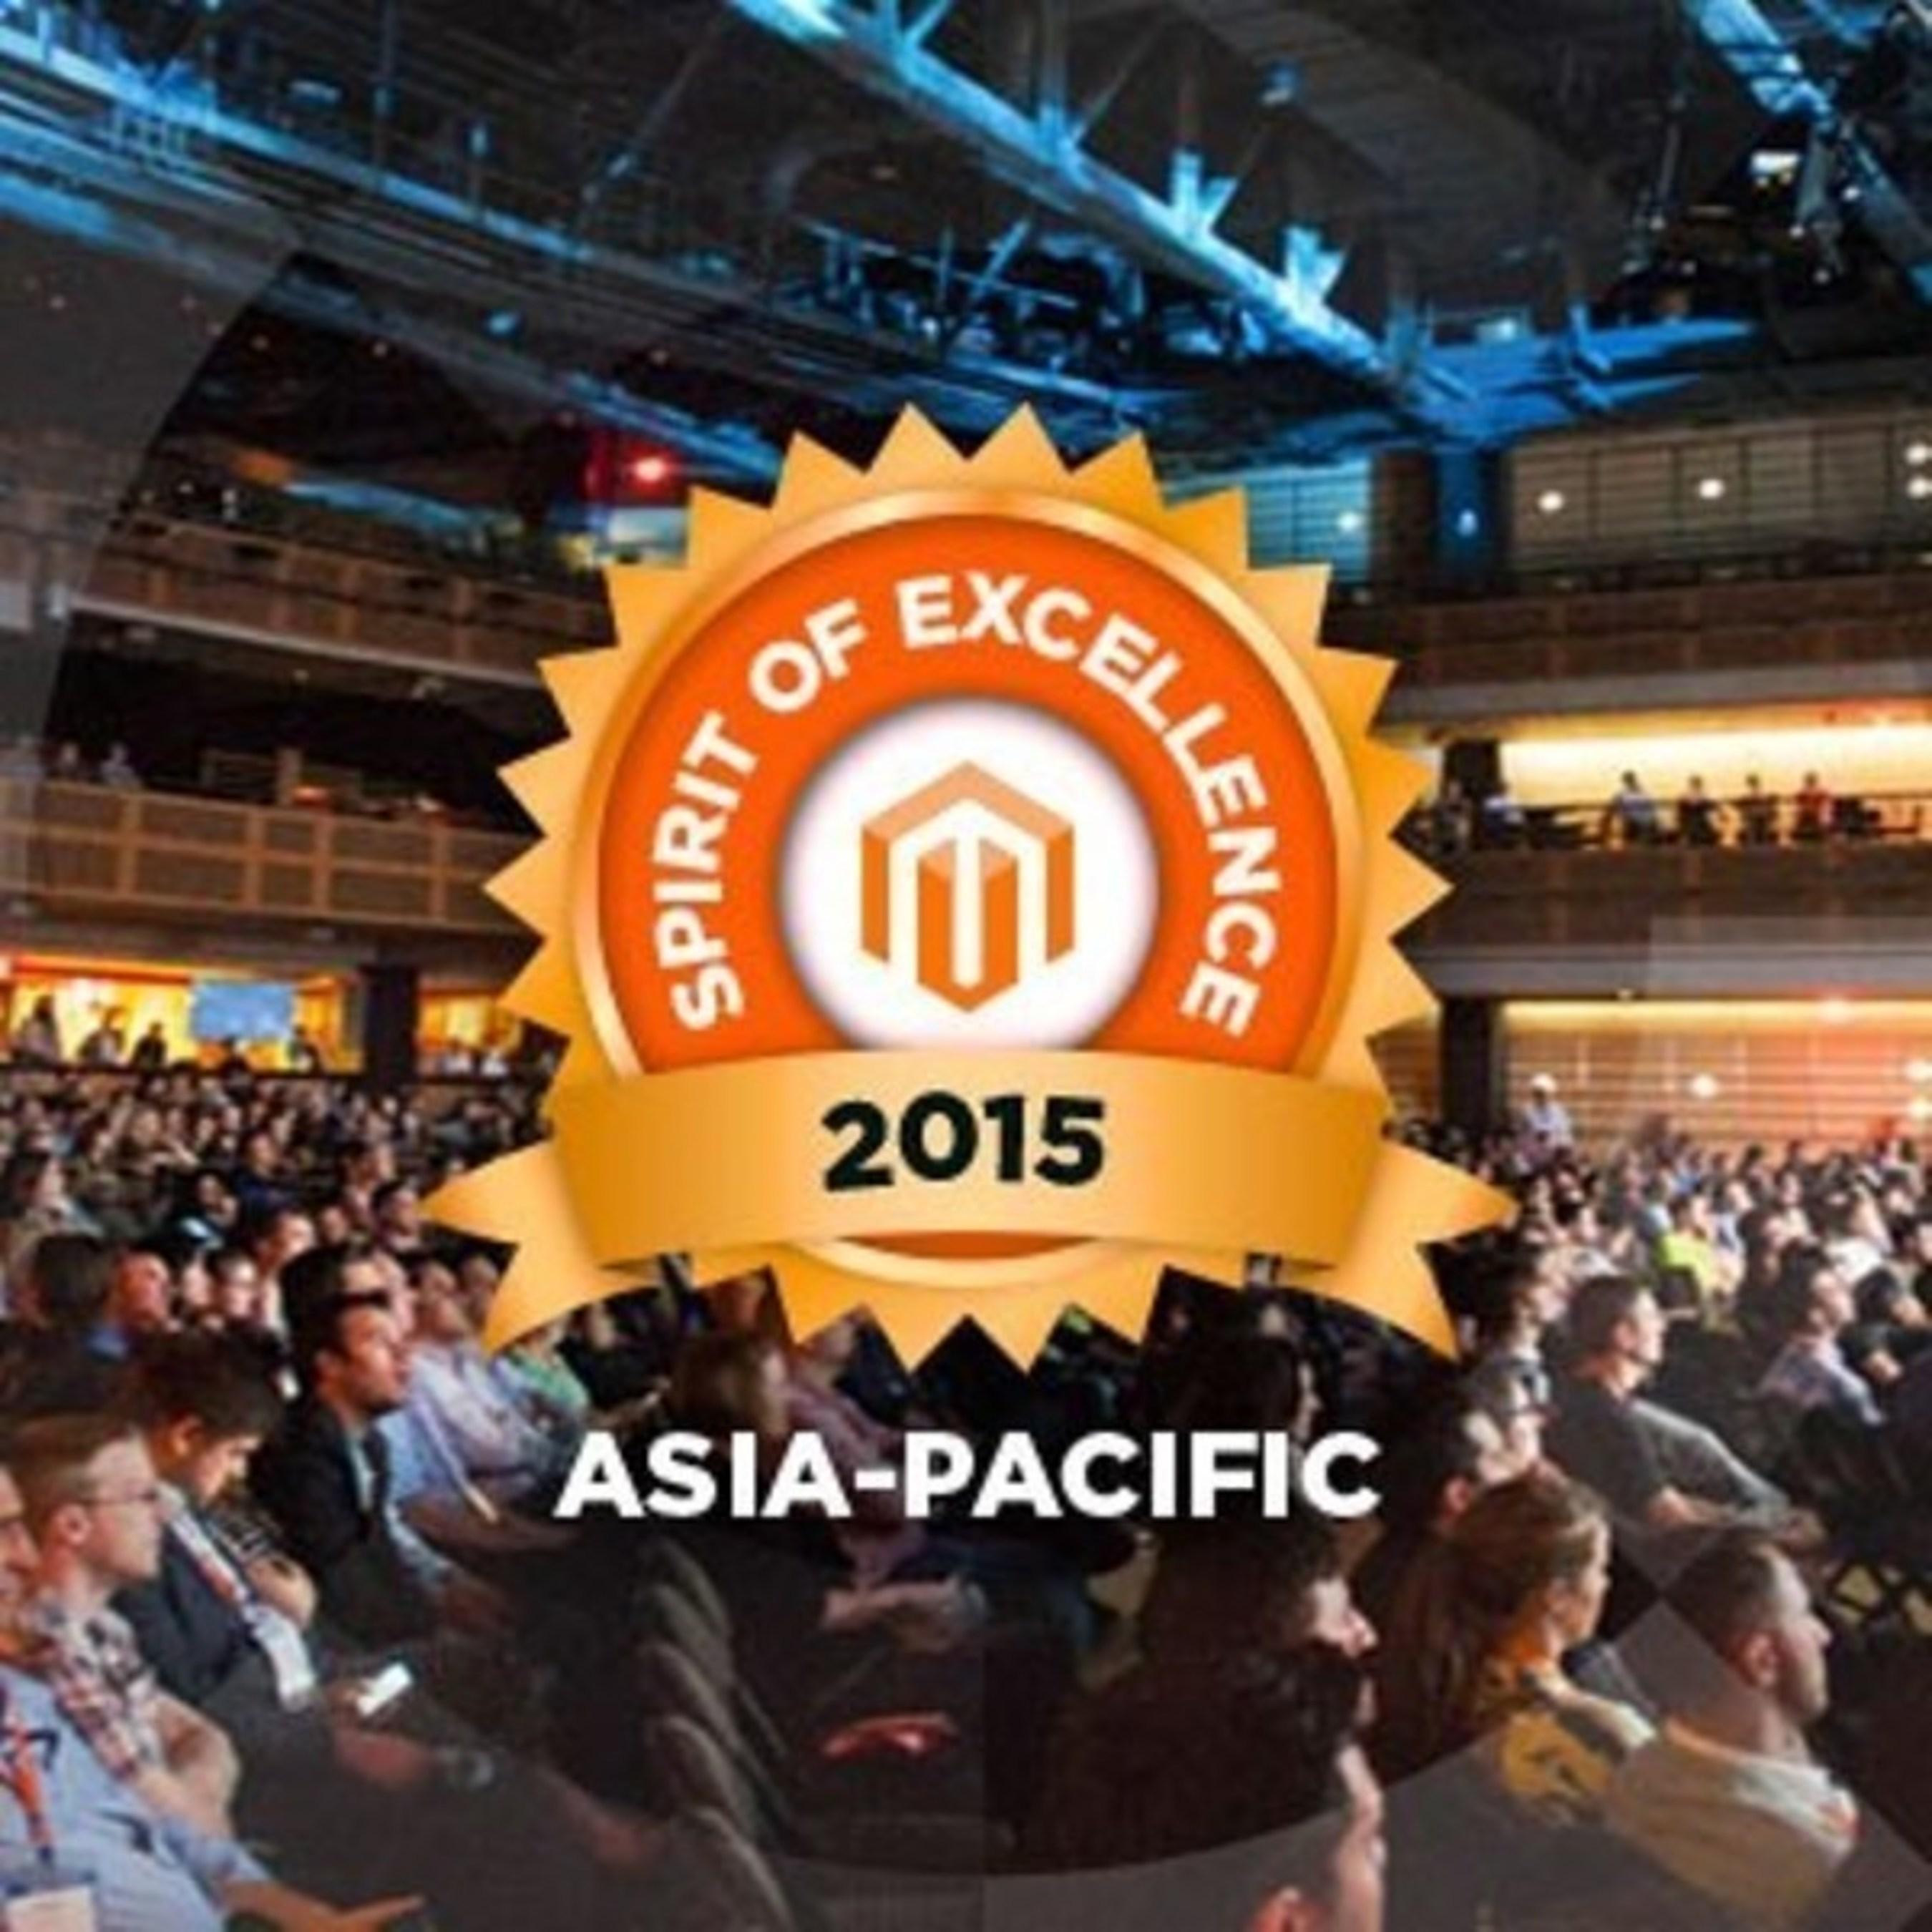 Sydney Digital Agency Infinity Technologies Receives 2015 Magento Spirit of Excellence Award